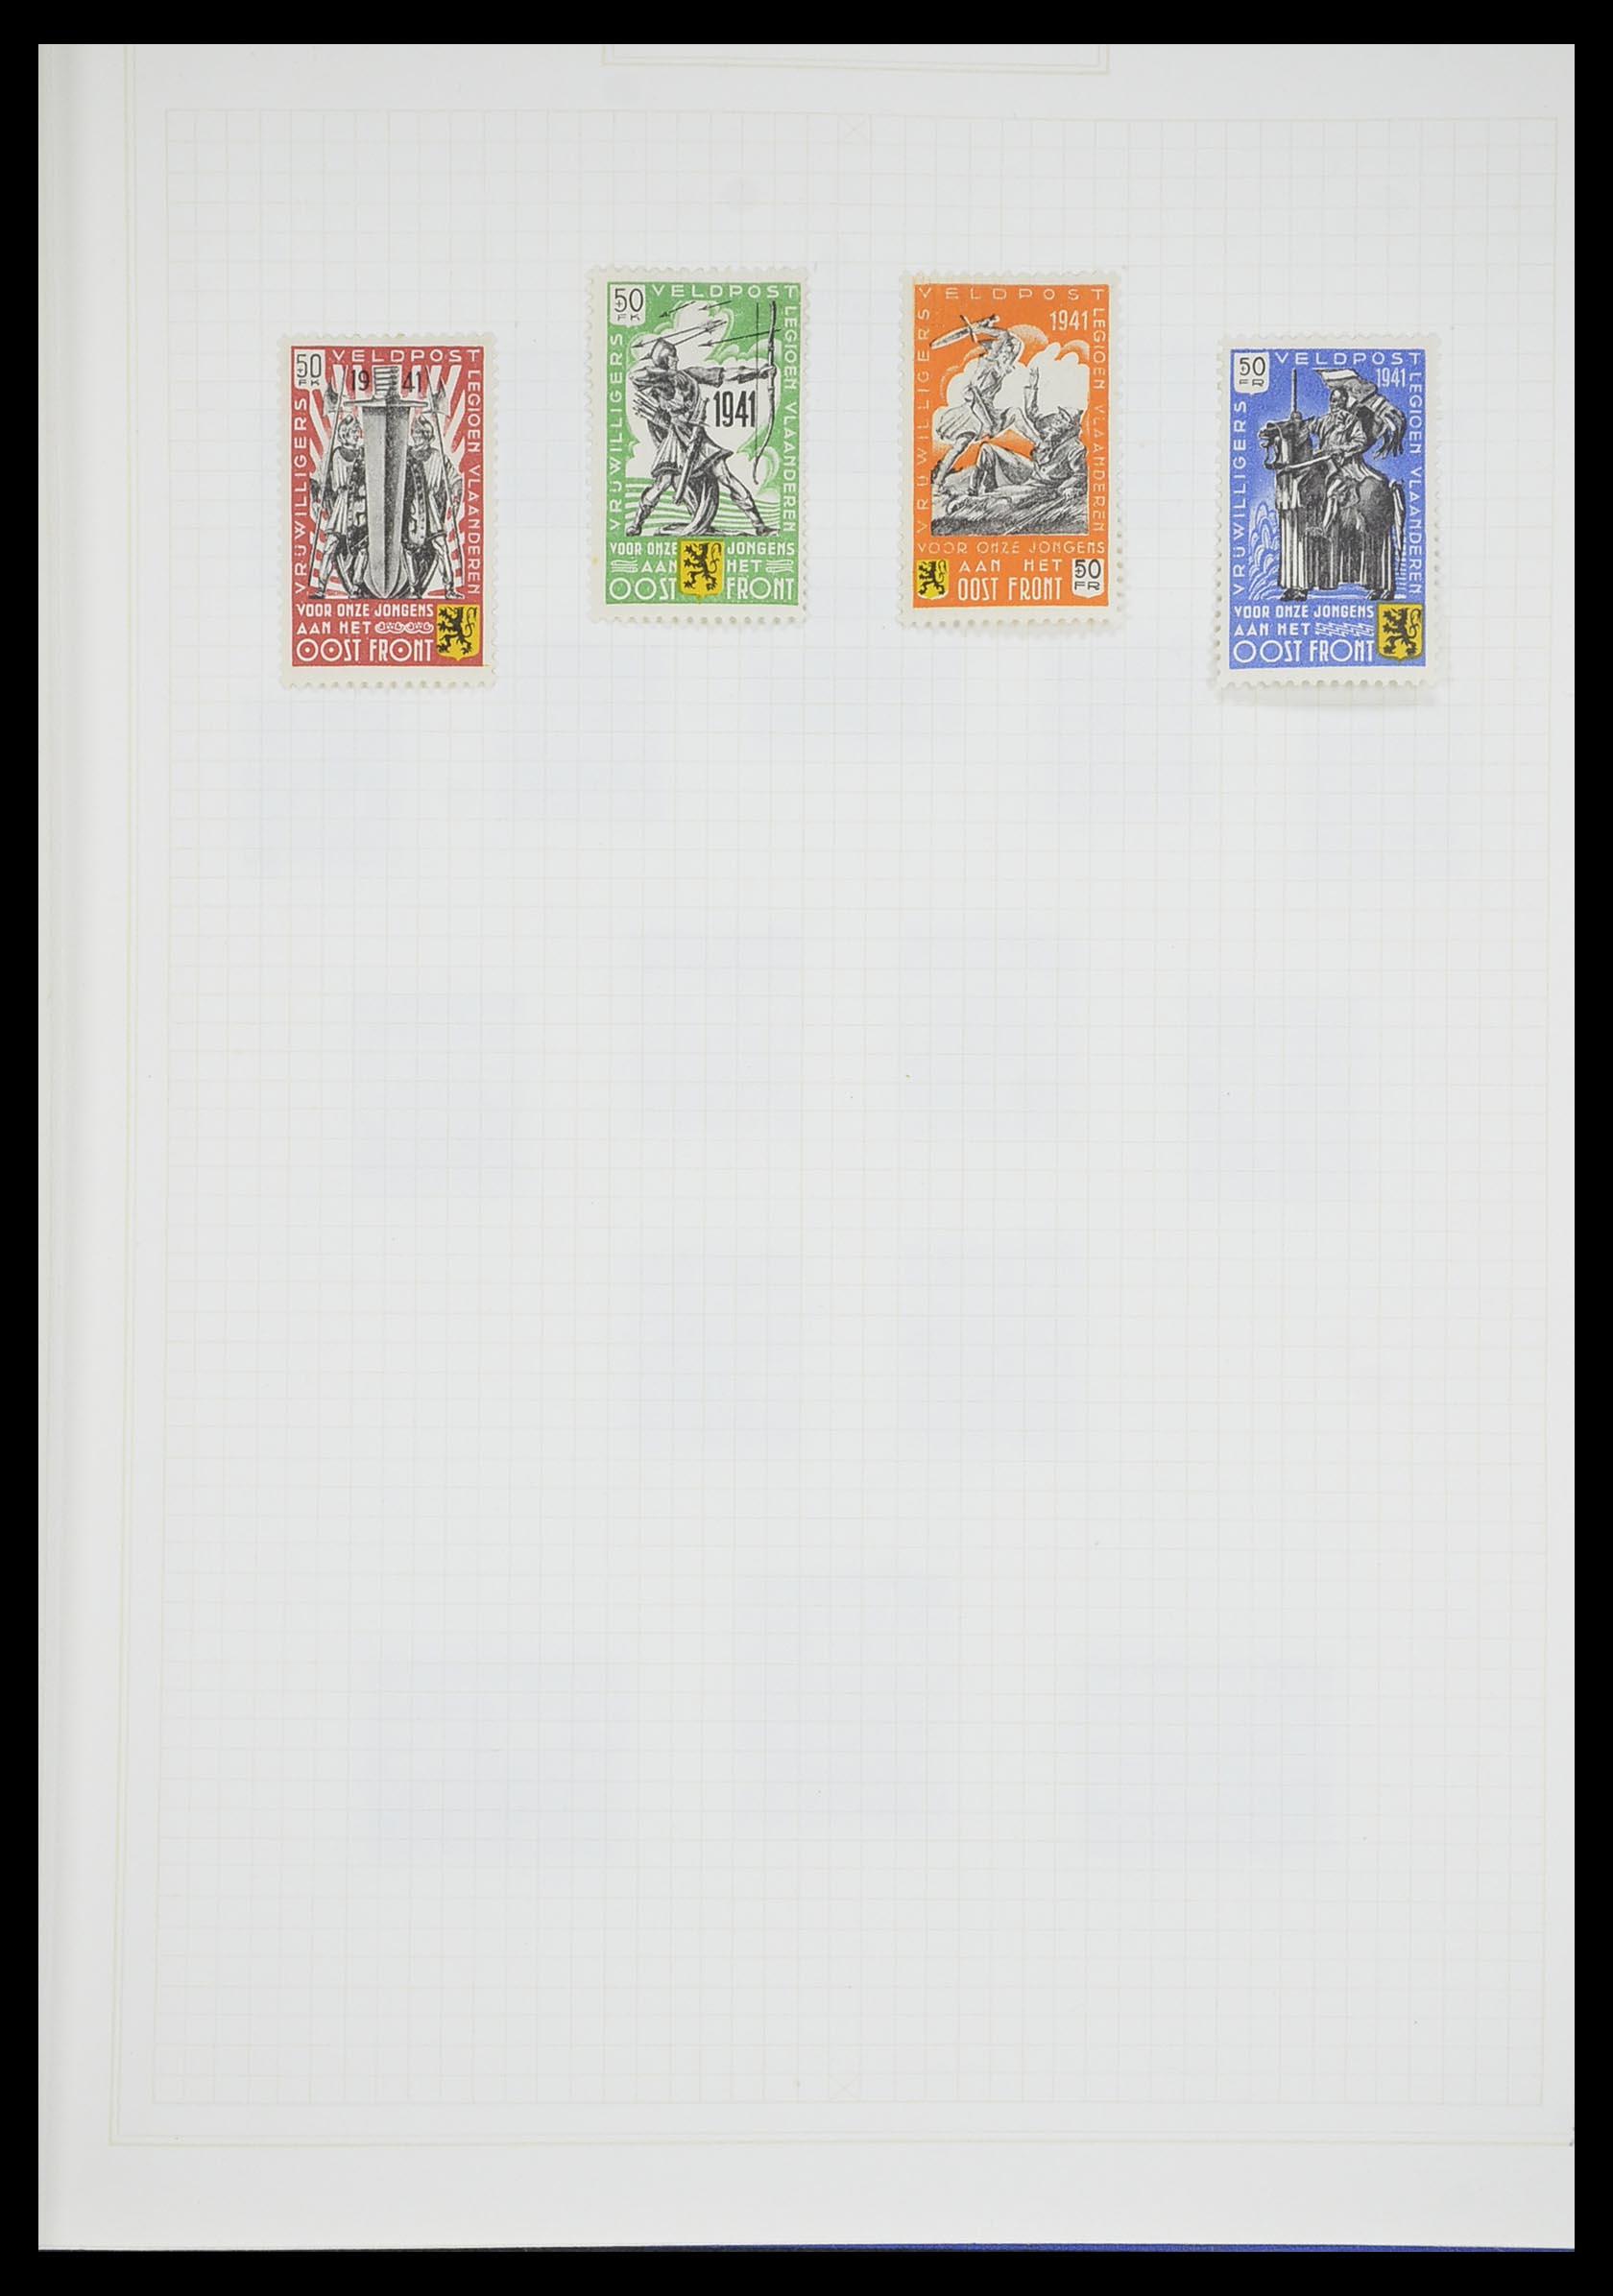 33713 011 - Postzegelverzameling 33713 Duitse bezettingen WO I en WO II 1914-1945